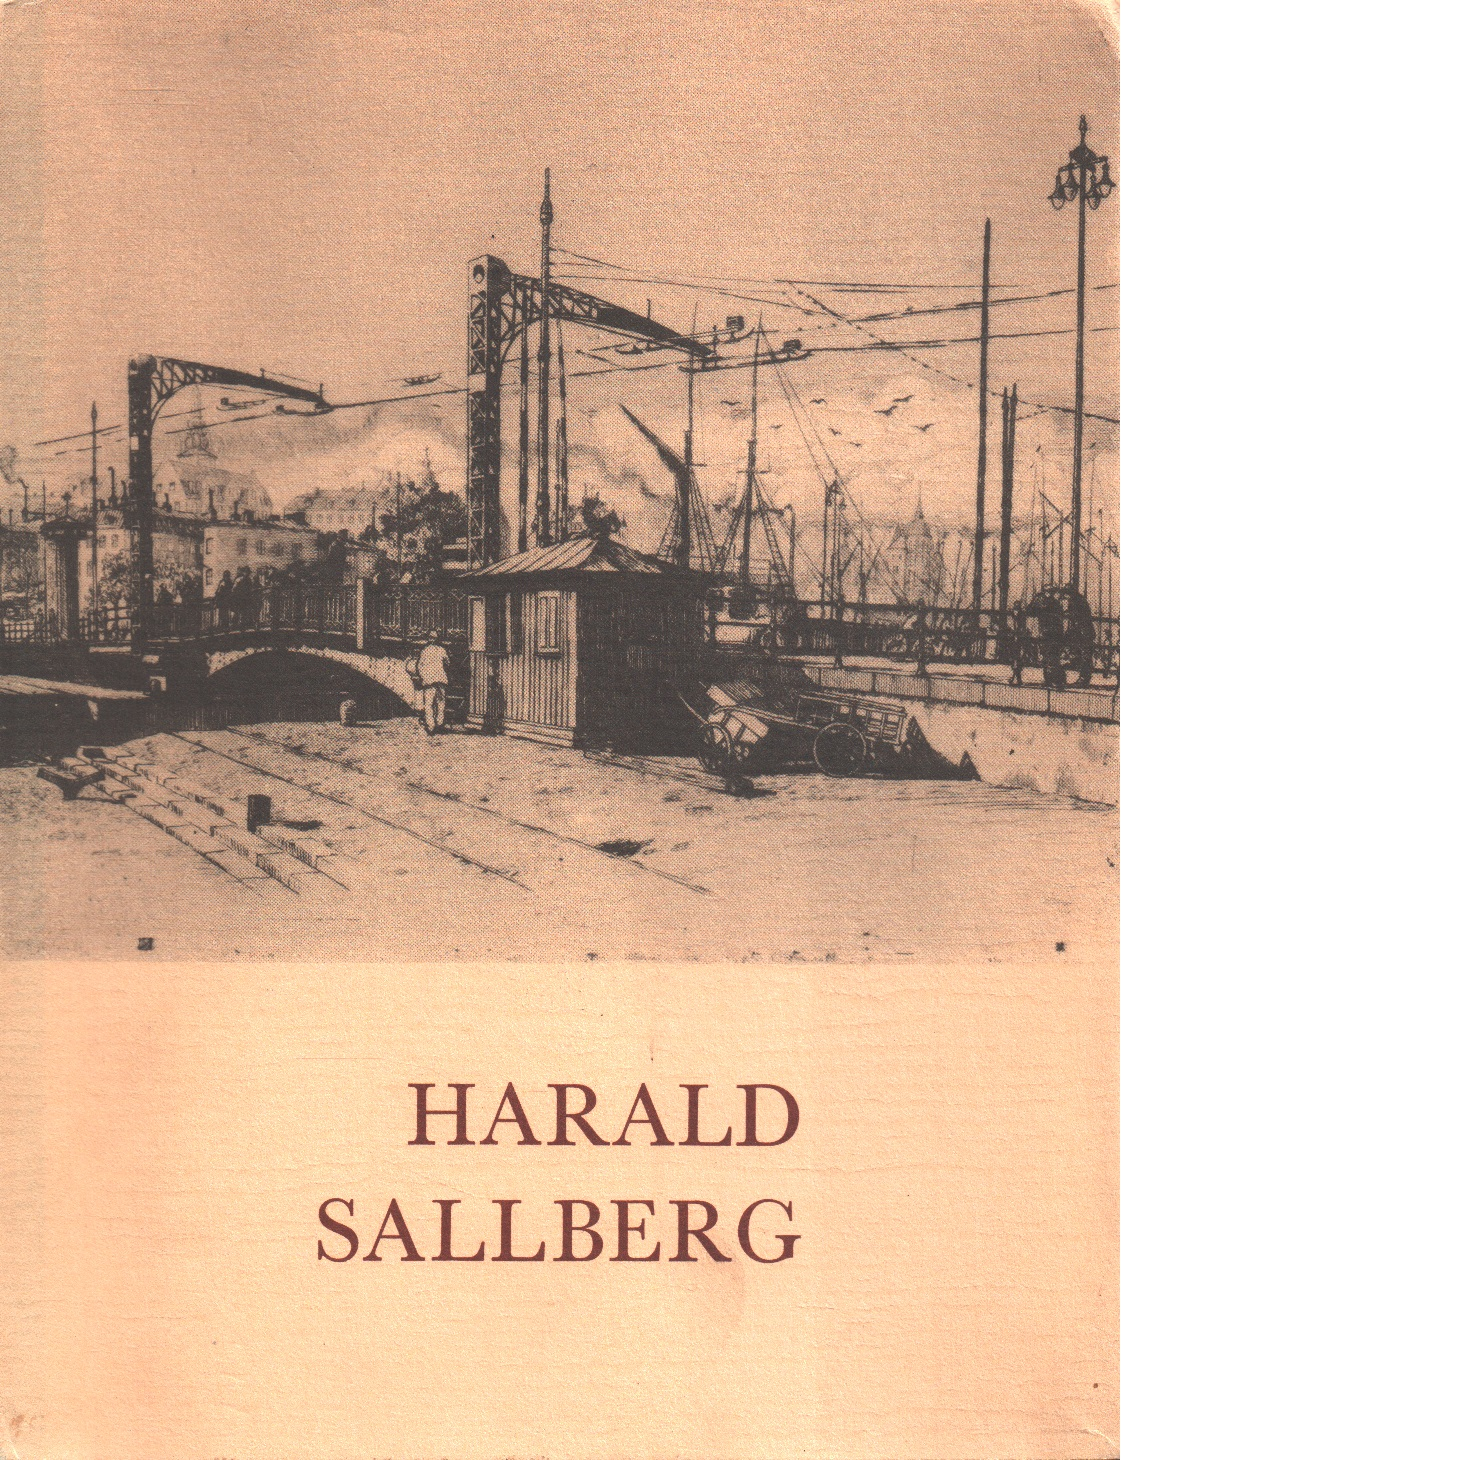 Harald Sallberg - Meyerson, Åke